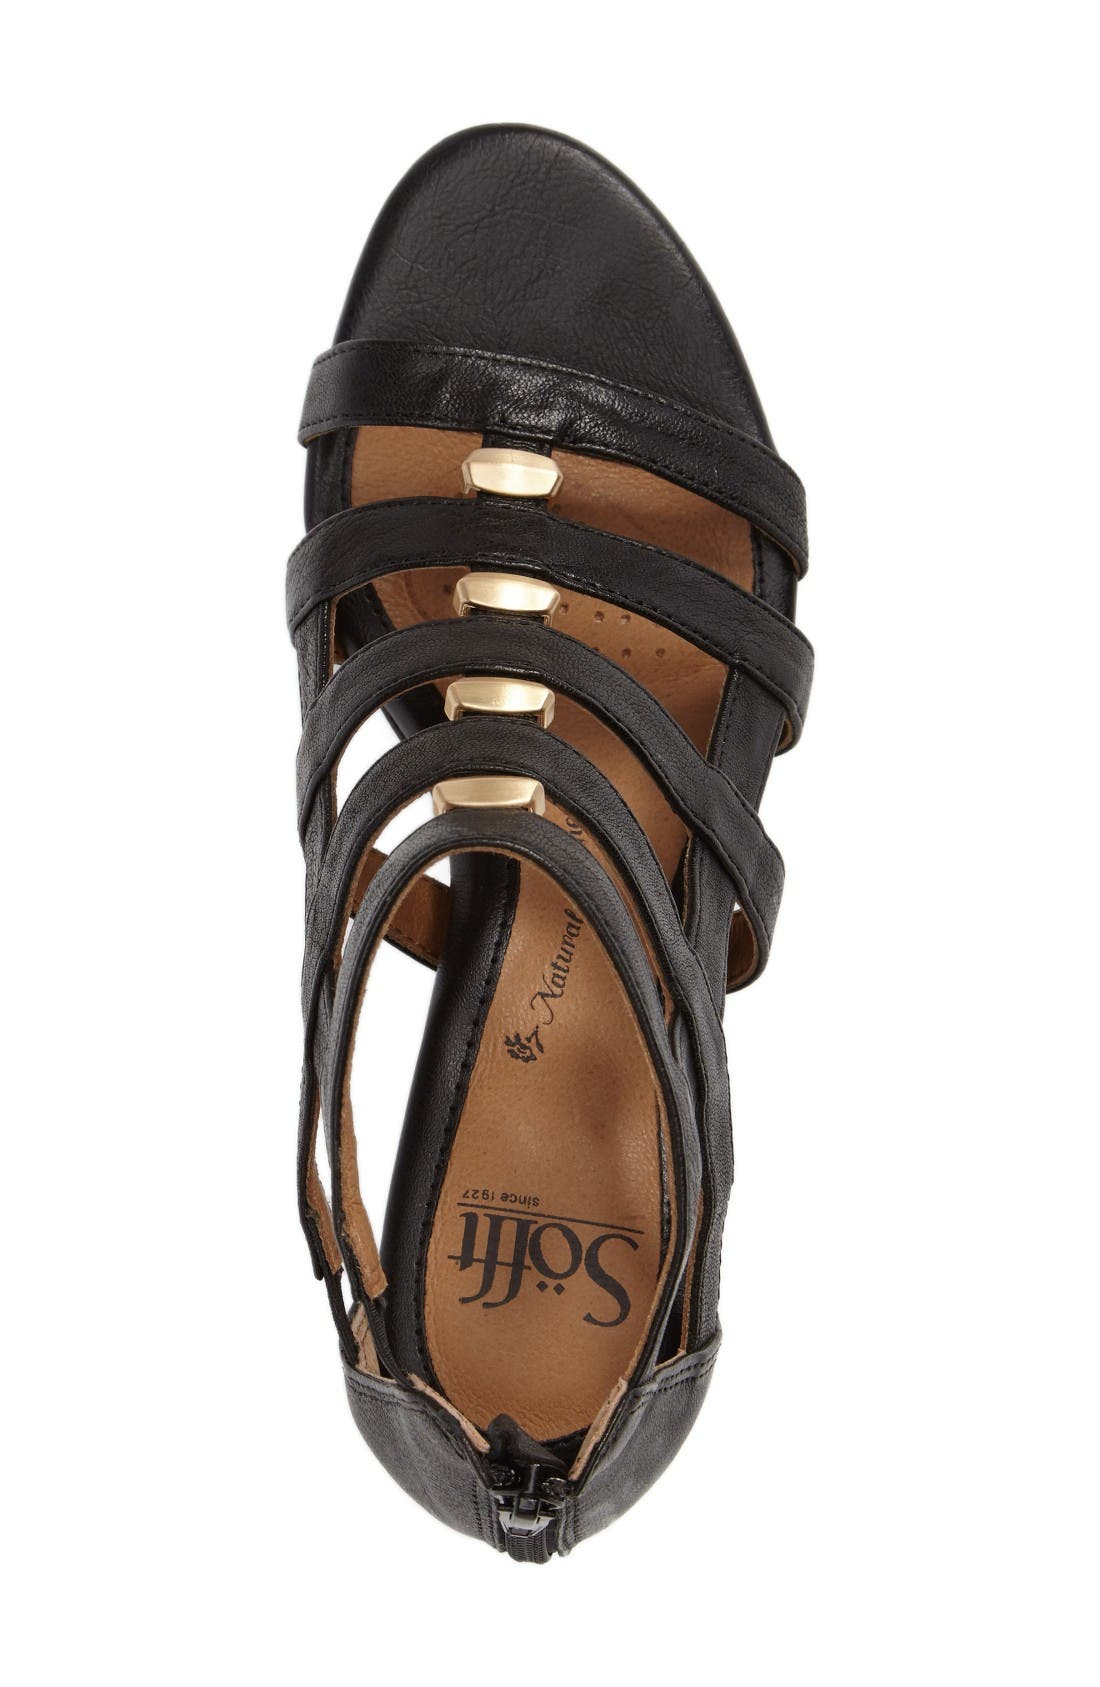 Rio Gladiator Wedge Sandal,                             Alternate thumbnail 3, color,                             Black Leather